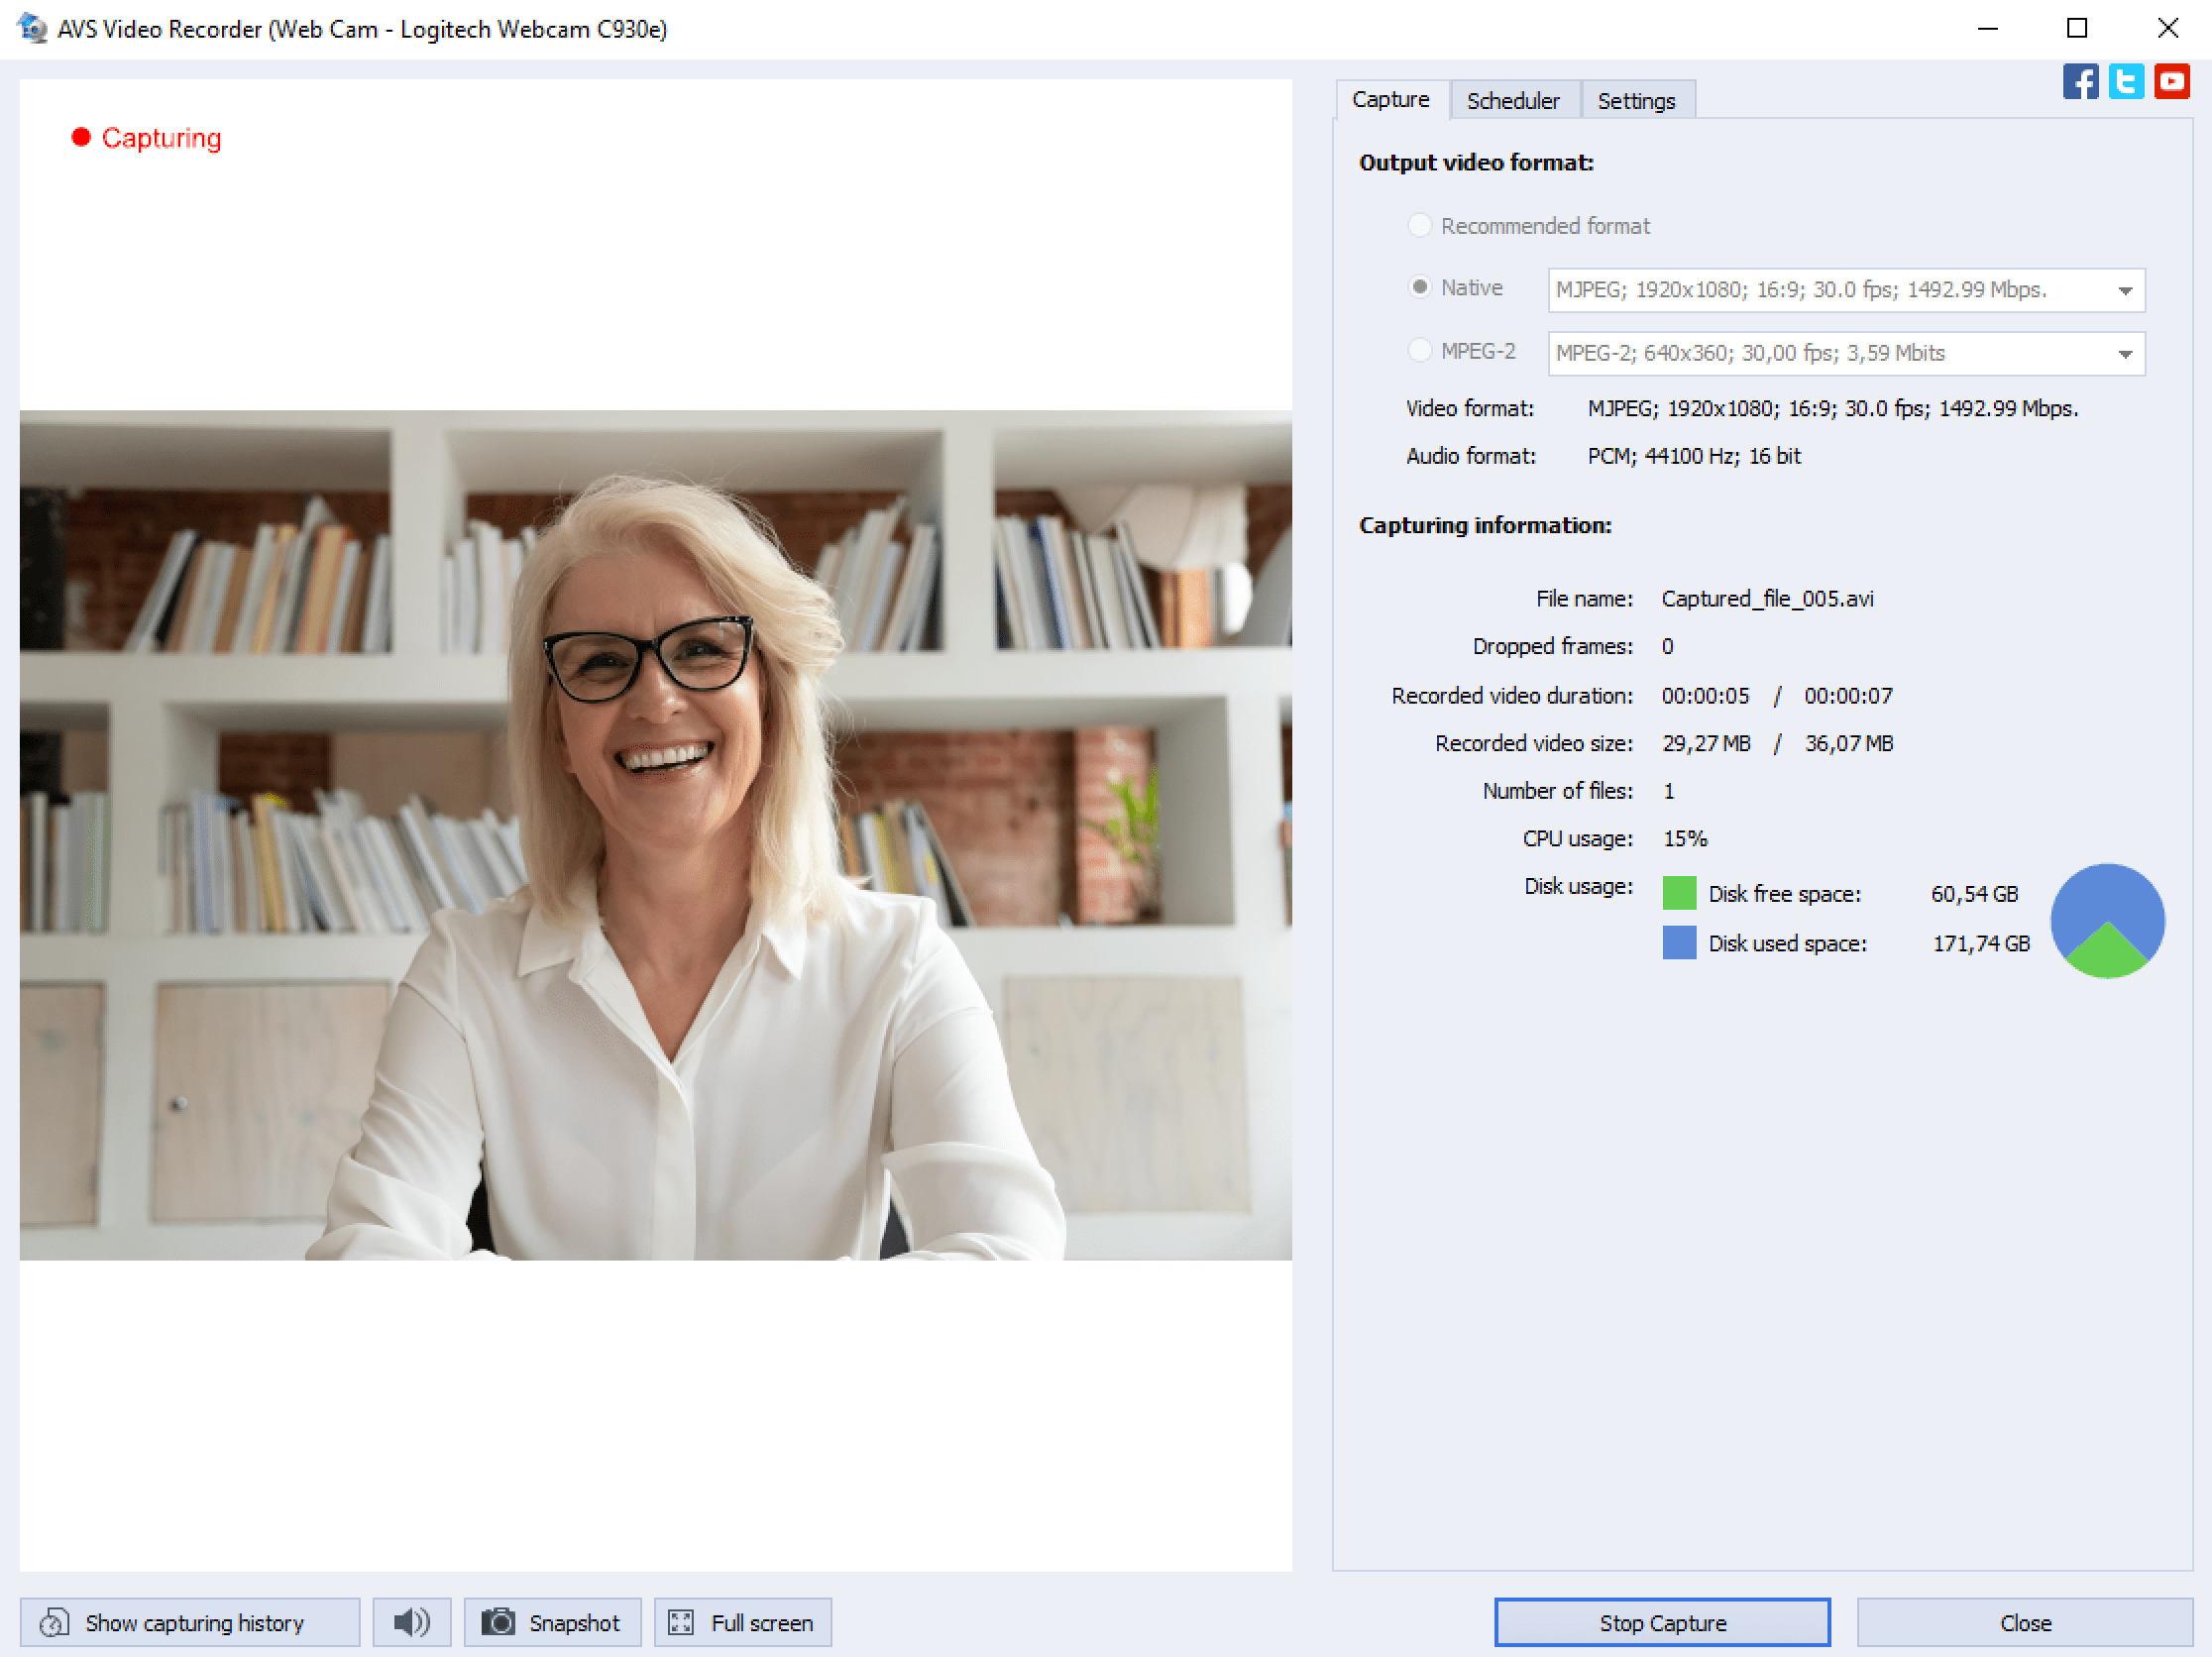 AVS Video Editor - Video Capture